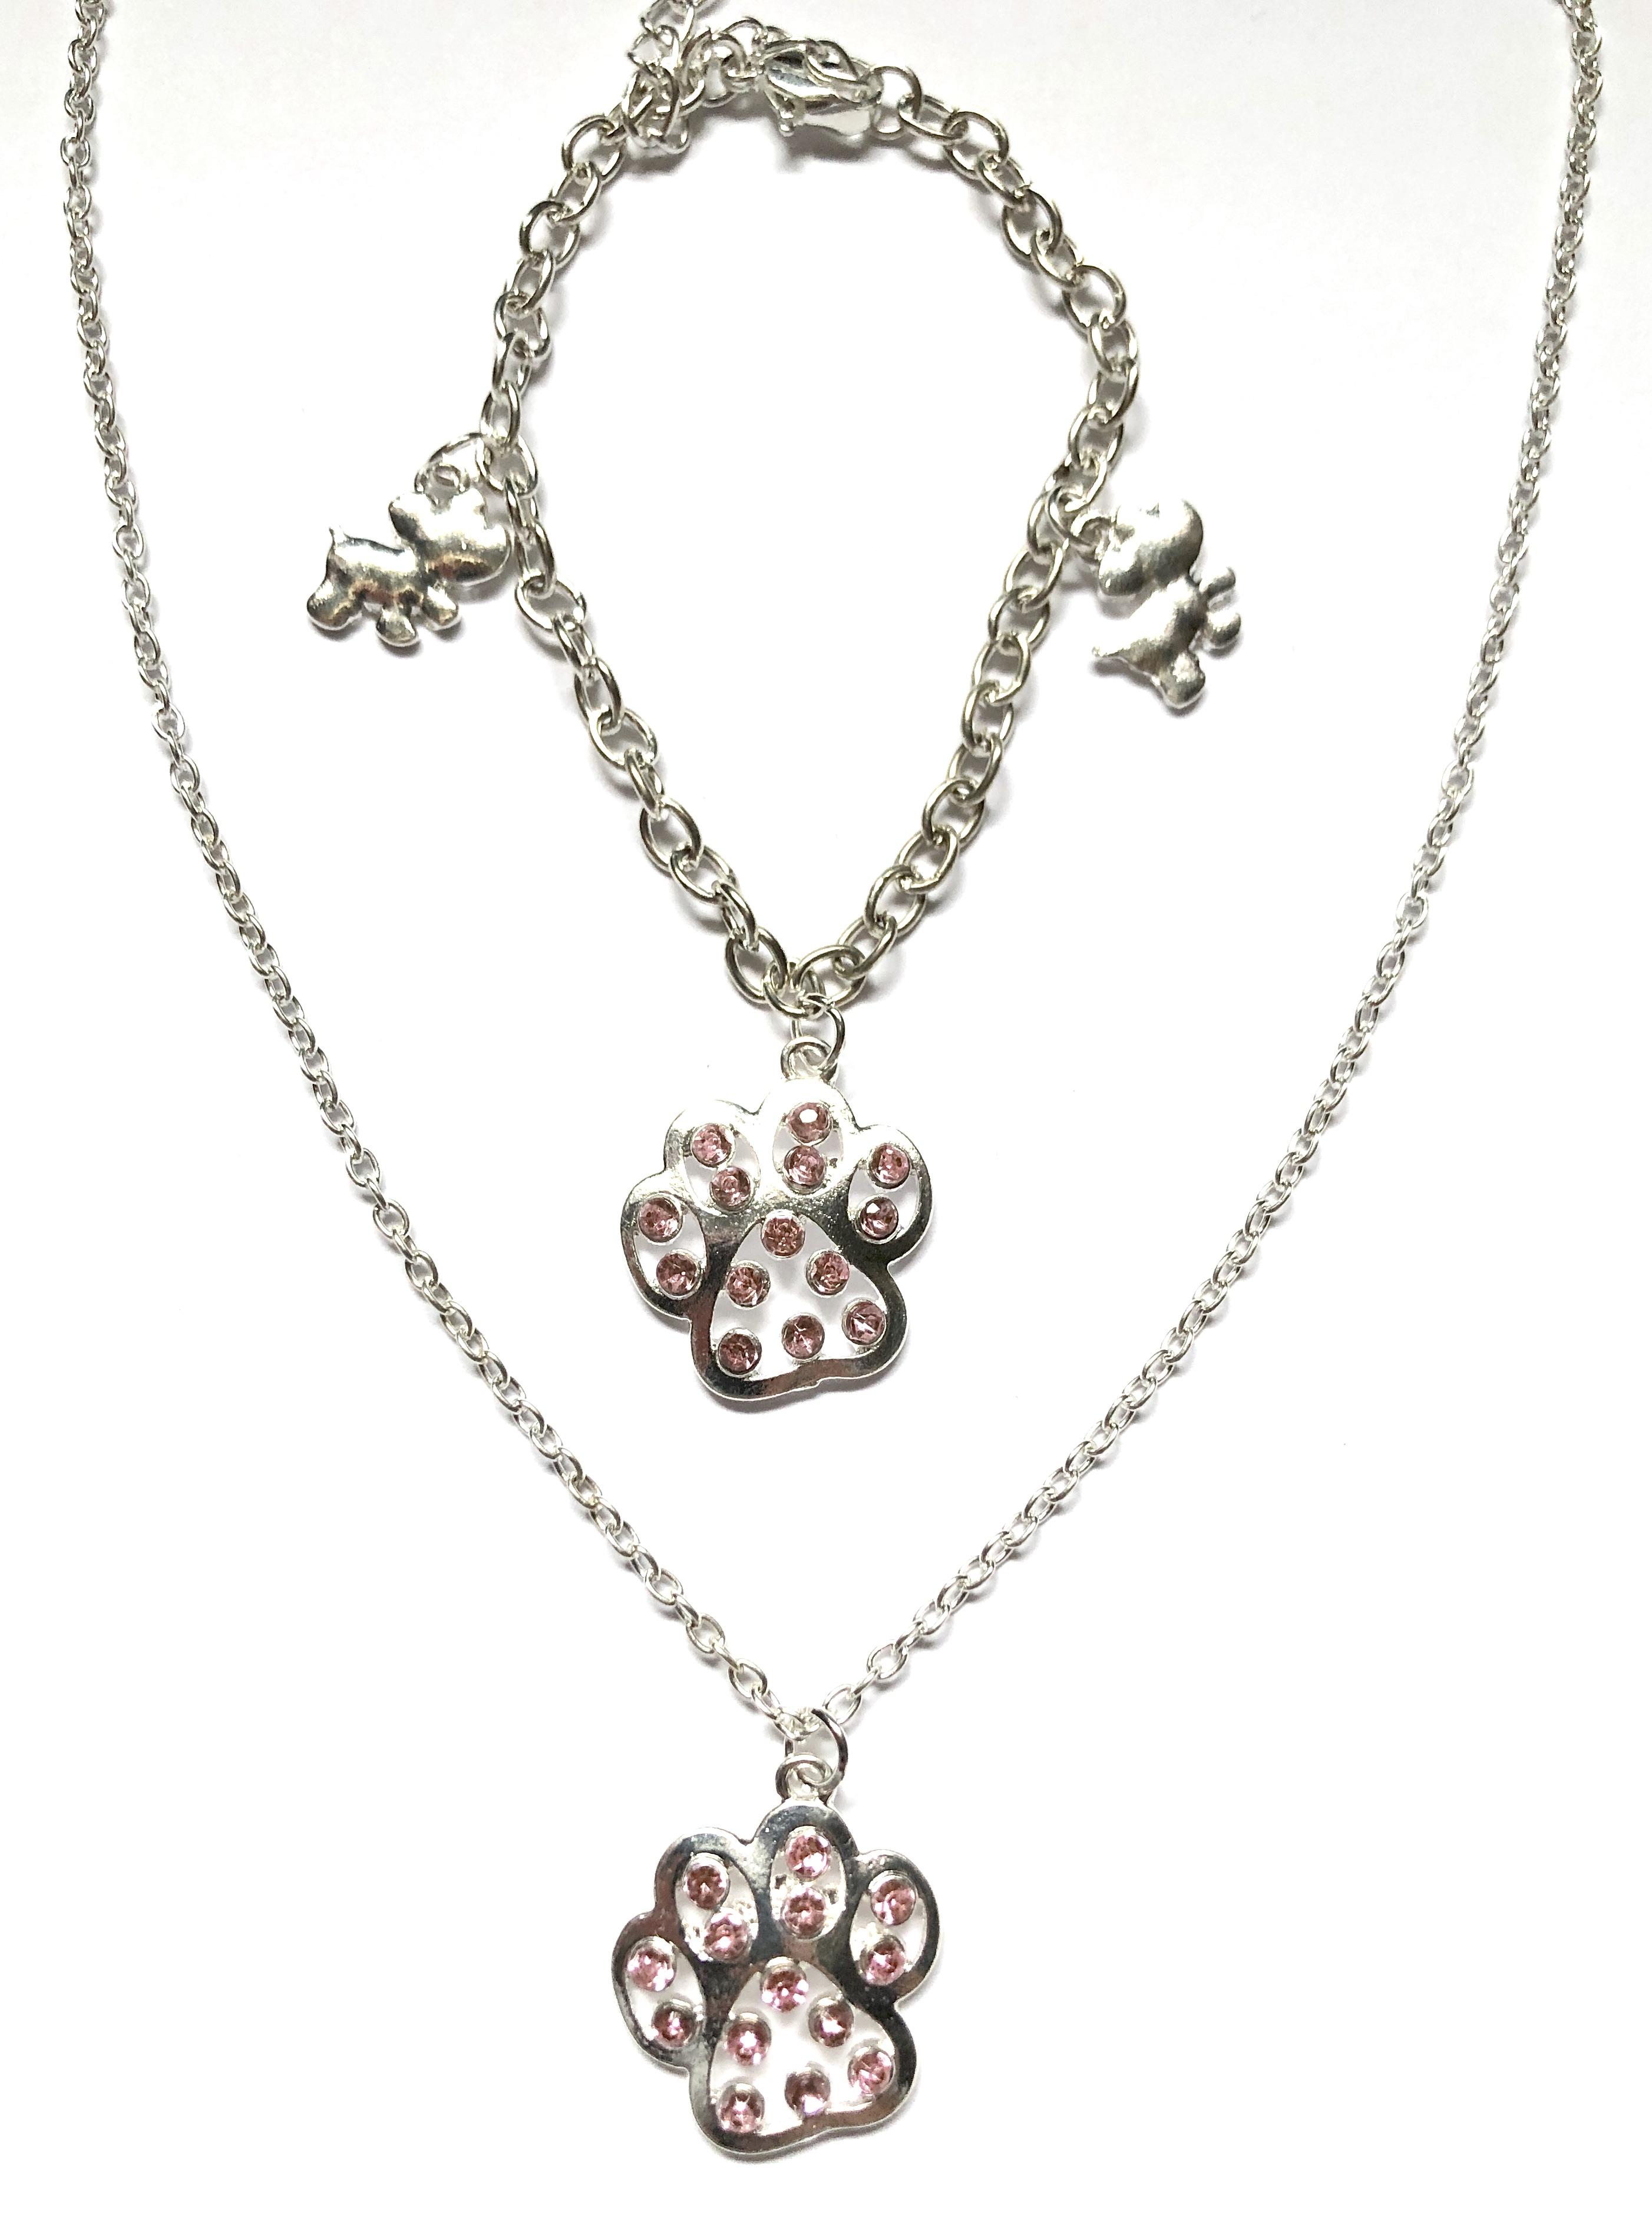 Paw Print Necklace & Bracelet